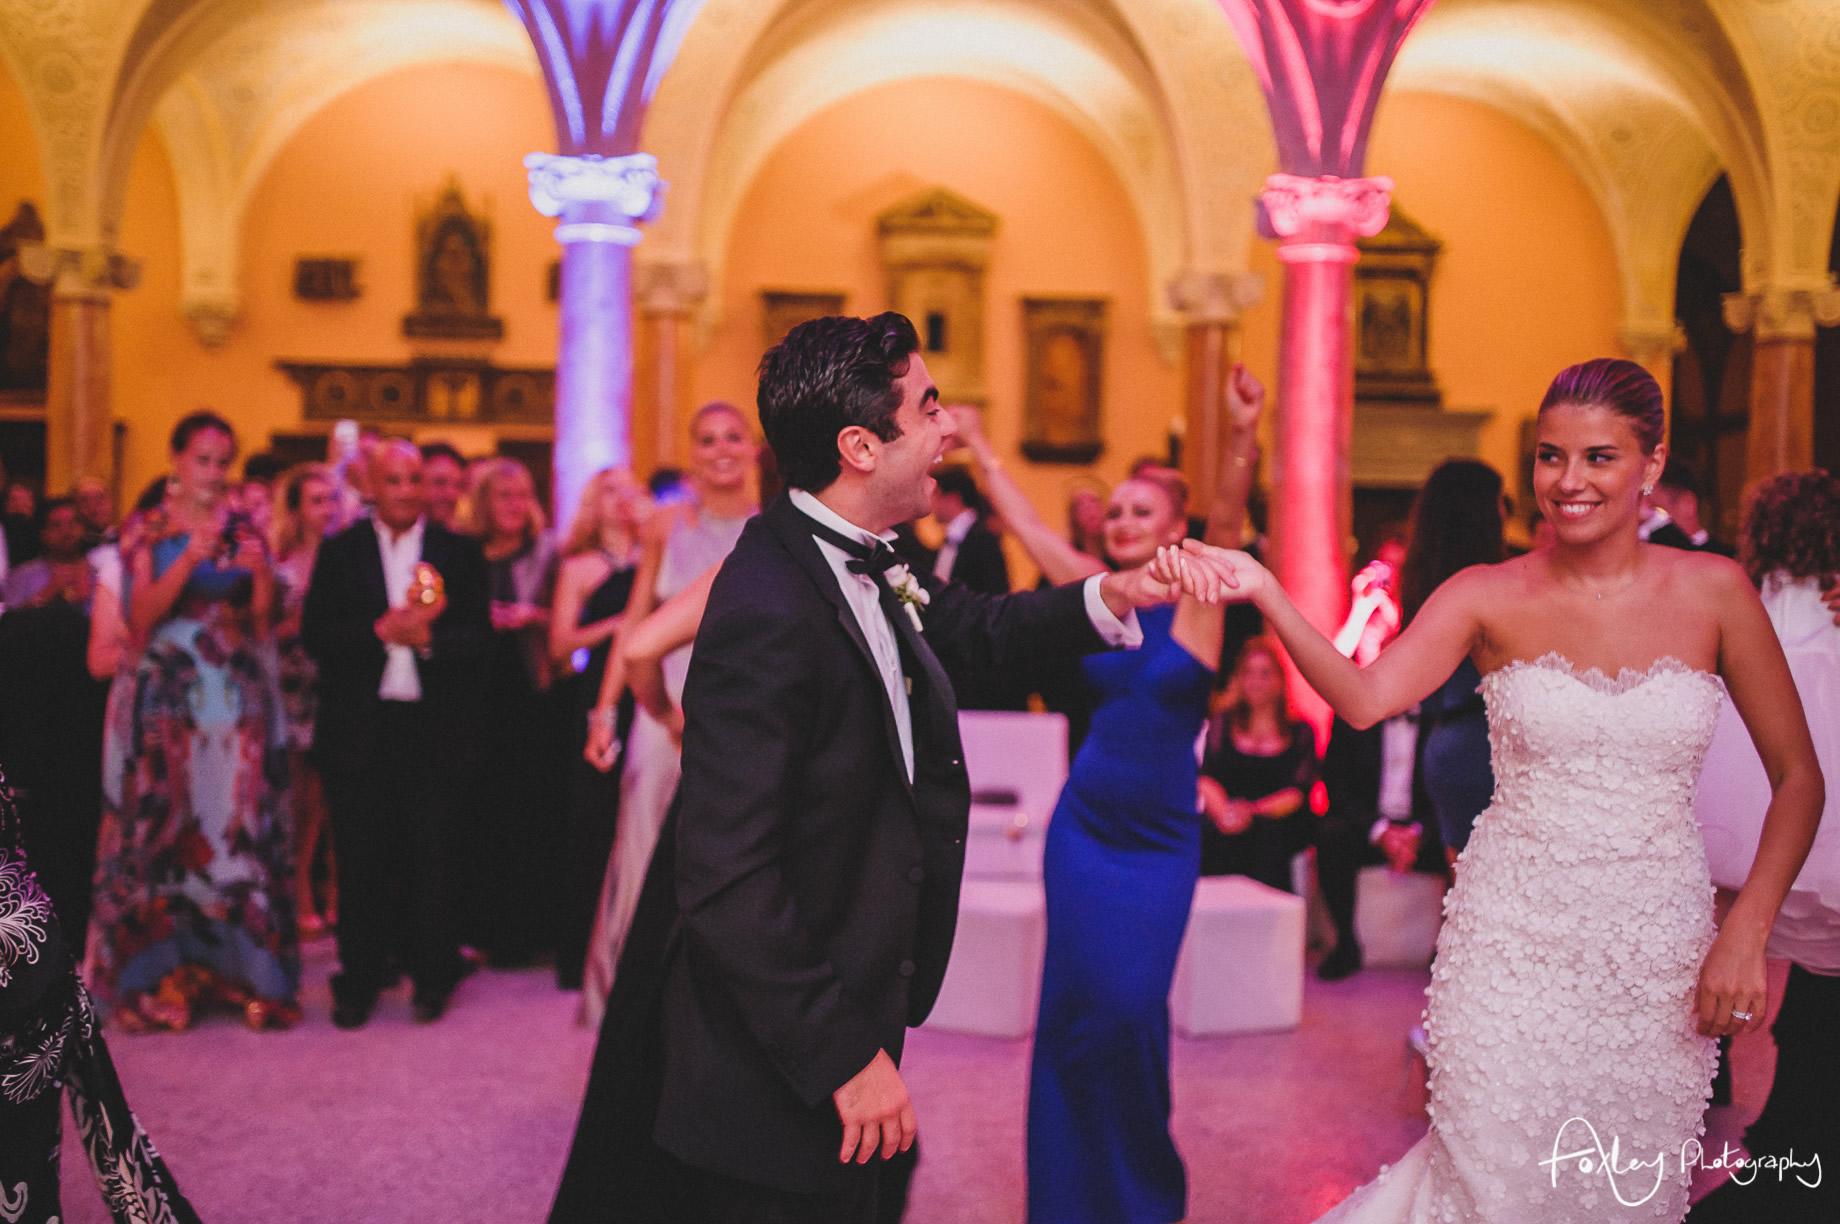 Jil and Will's Wedding at Villa Ephrussi De Rothschild 225